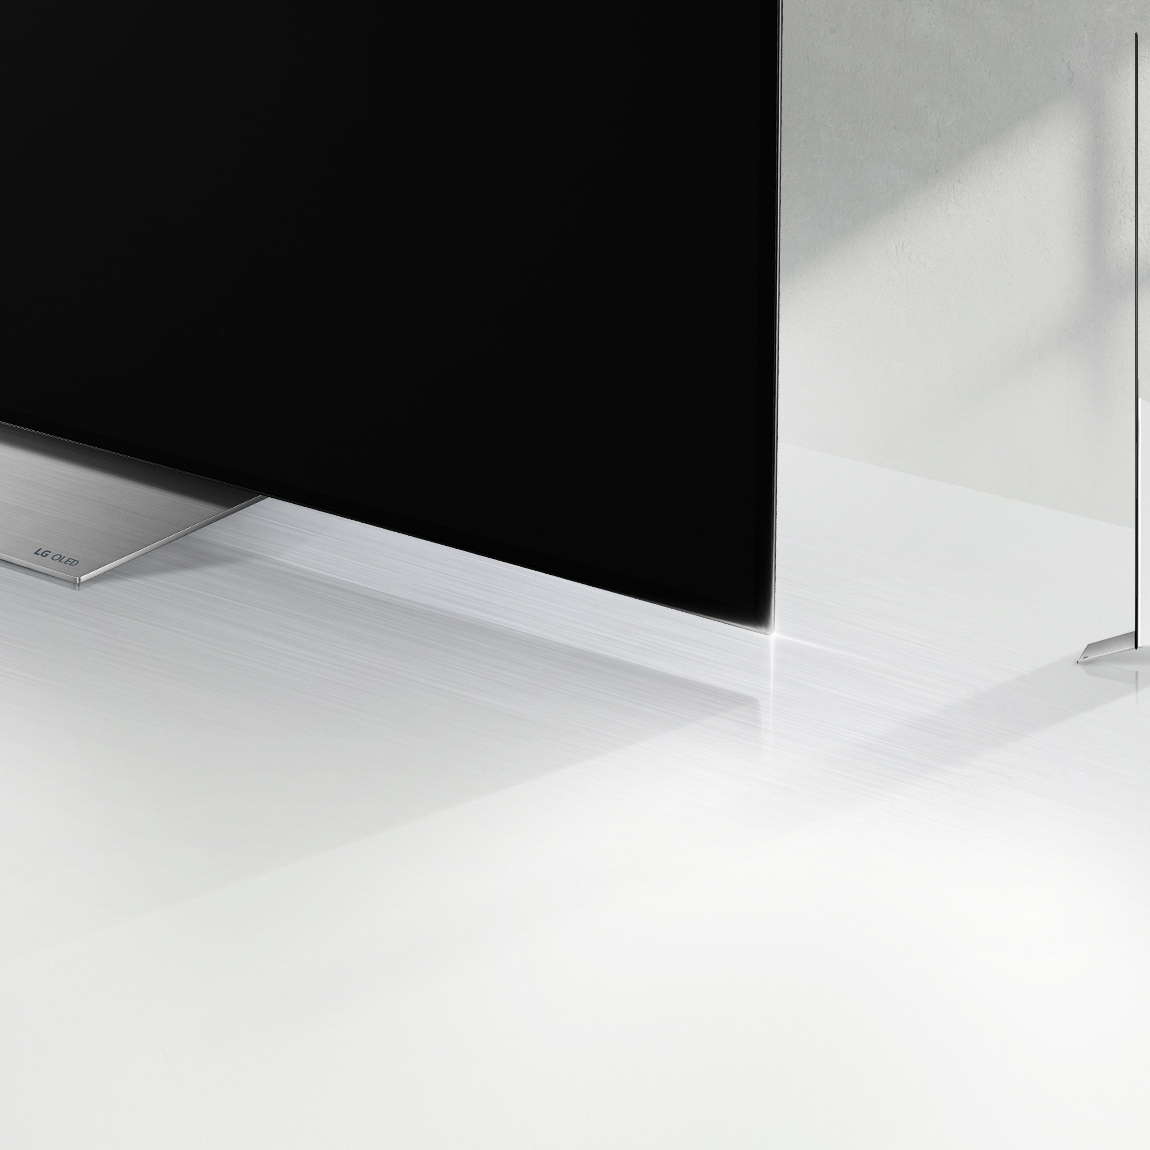 OLEDC7